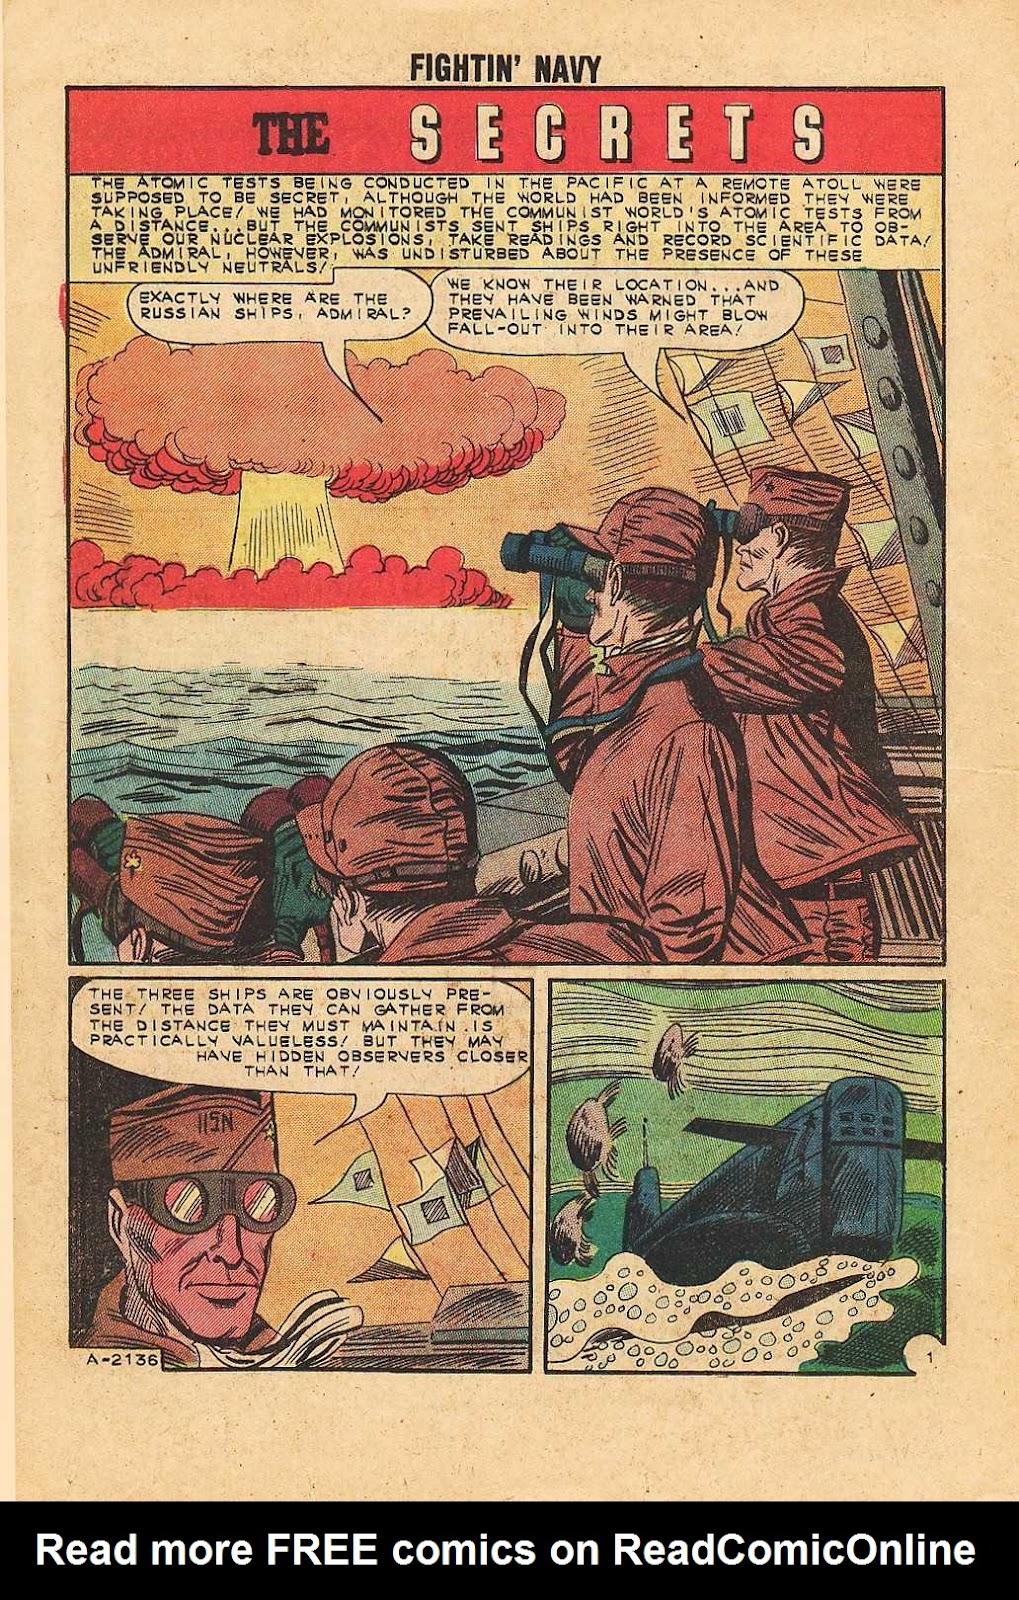 Read online Fightin' Navy comic -  Issue #113 - 16